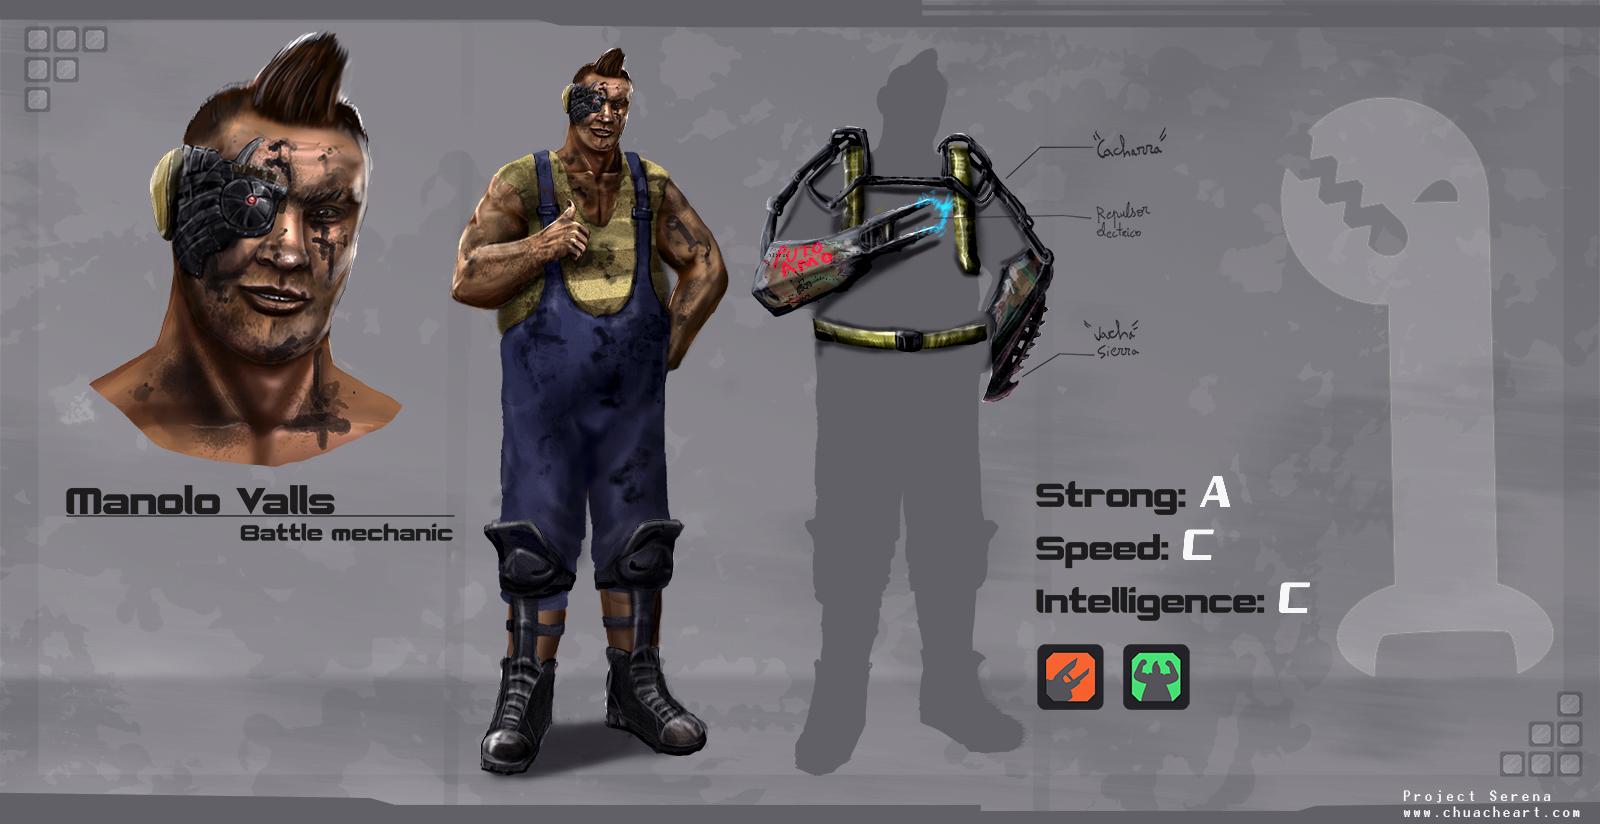 Manolo Valls - Combat mechanic by Ryoishen